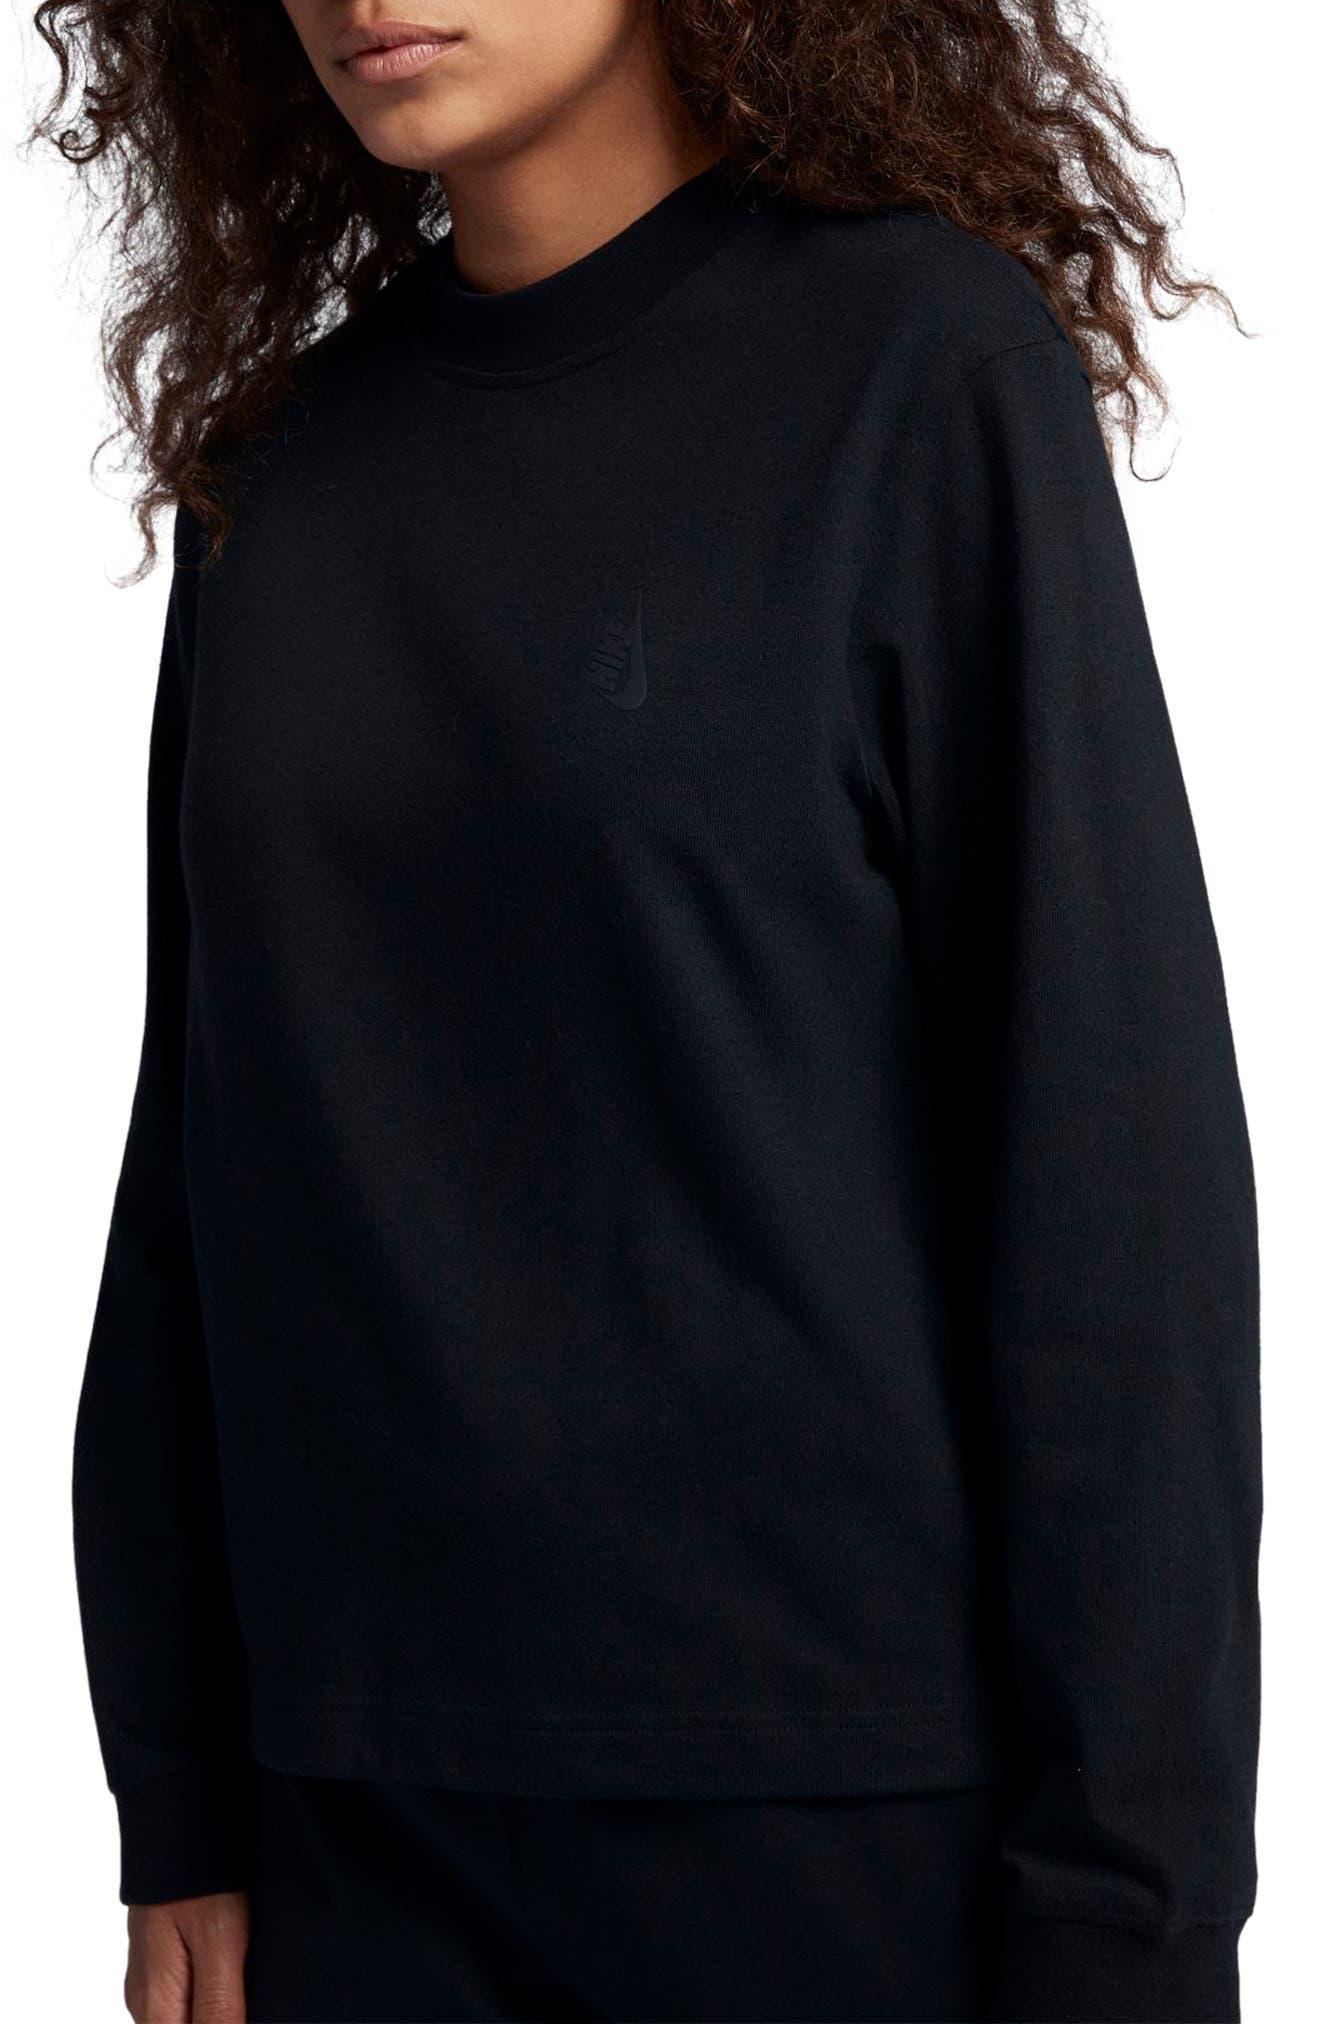 NikeLab Essentials Women's Long Sleeve Mock Neck Tee,                         Main,                         color, 010